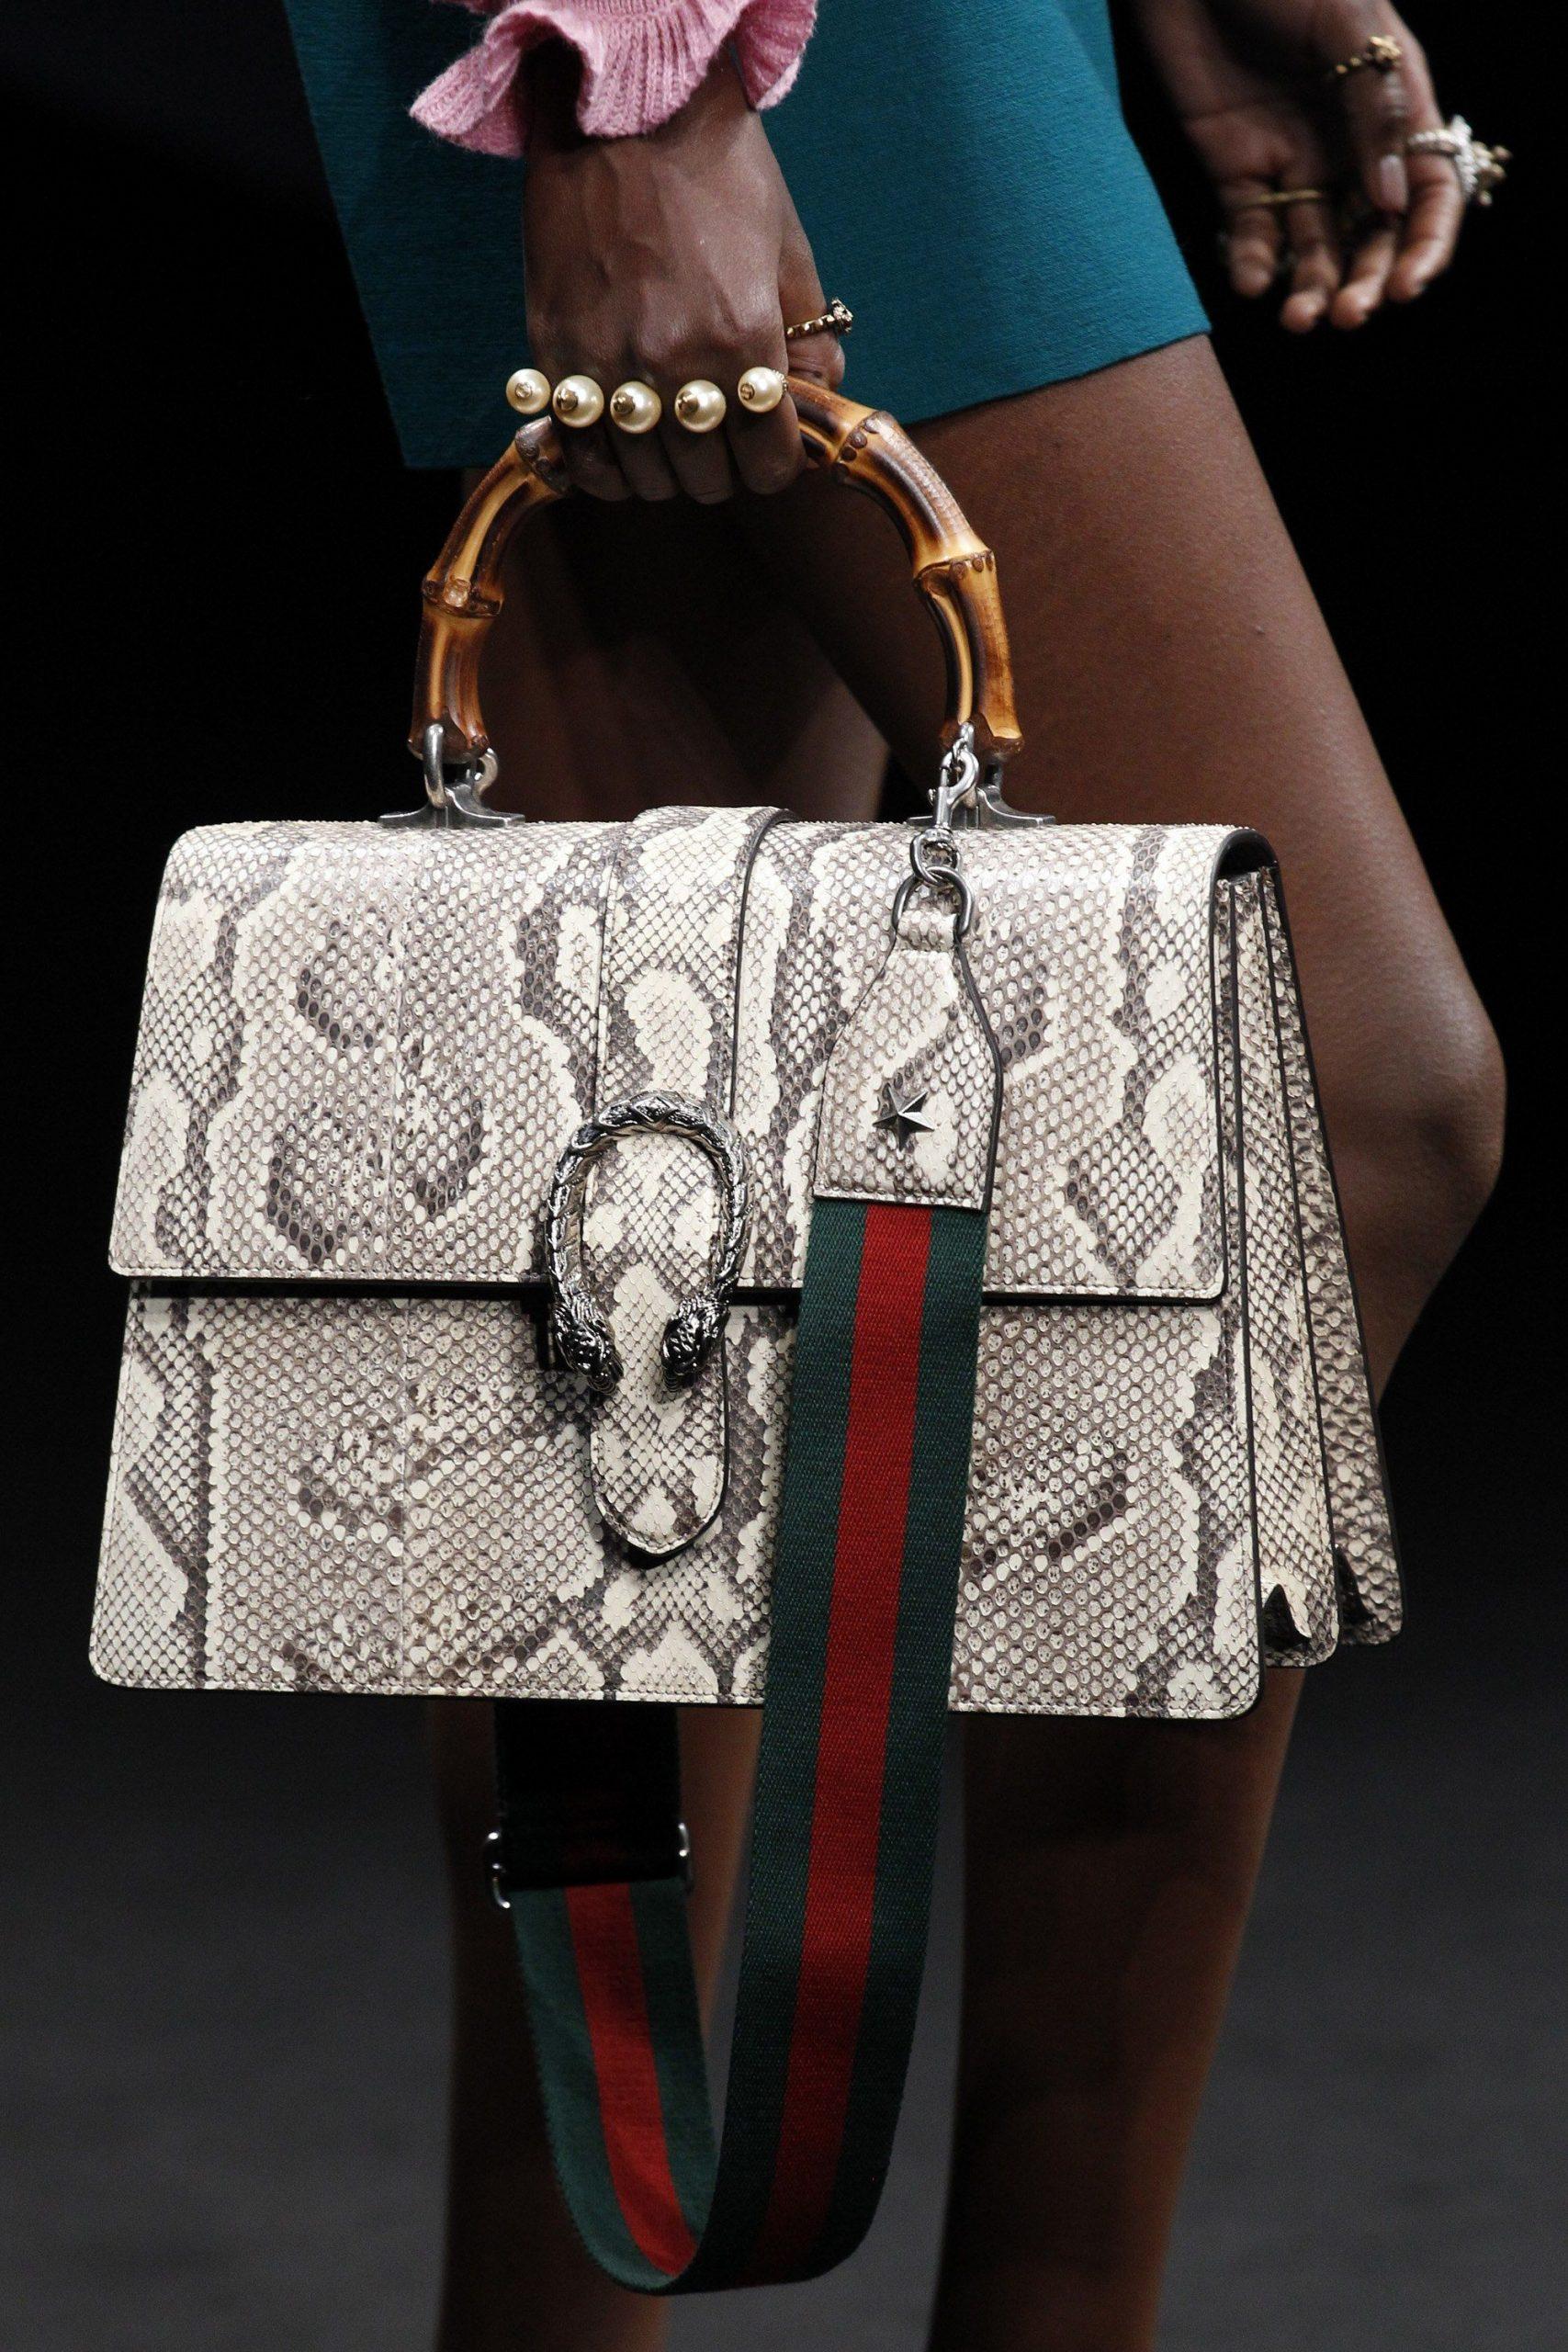 20 Genial Gucci Abendkleid Stylish13 Leicht Gucci Abendkleid Ärmel